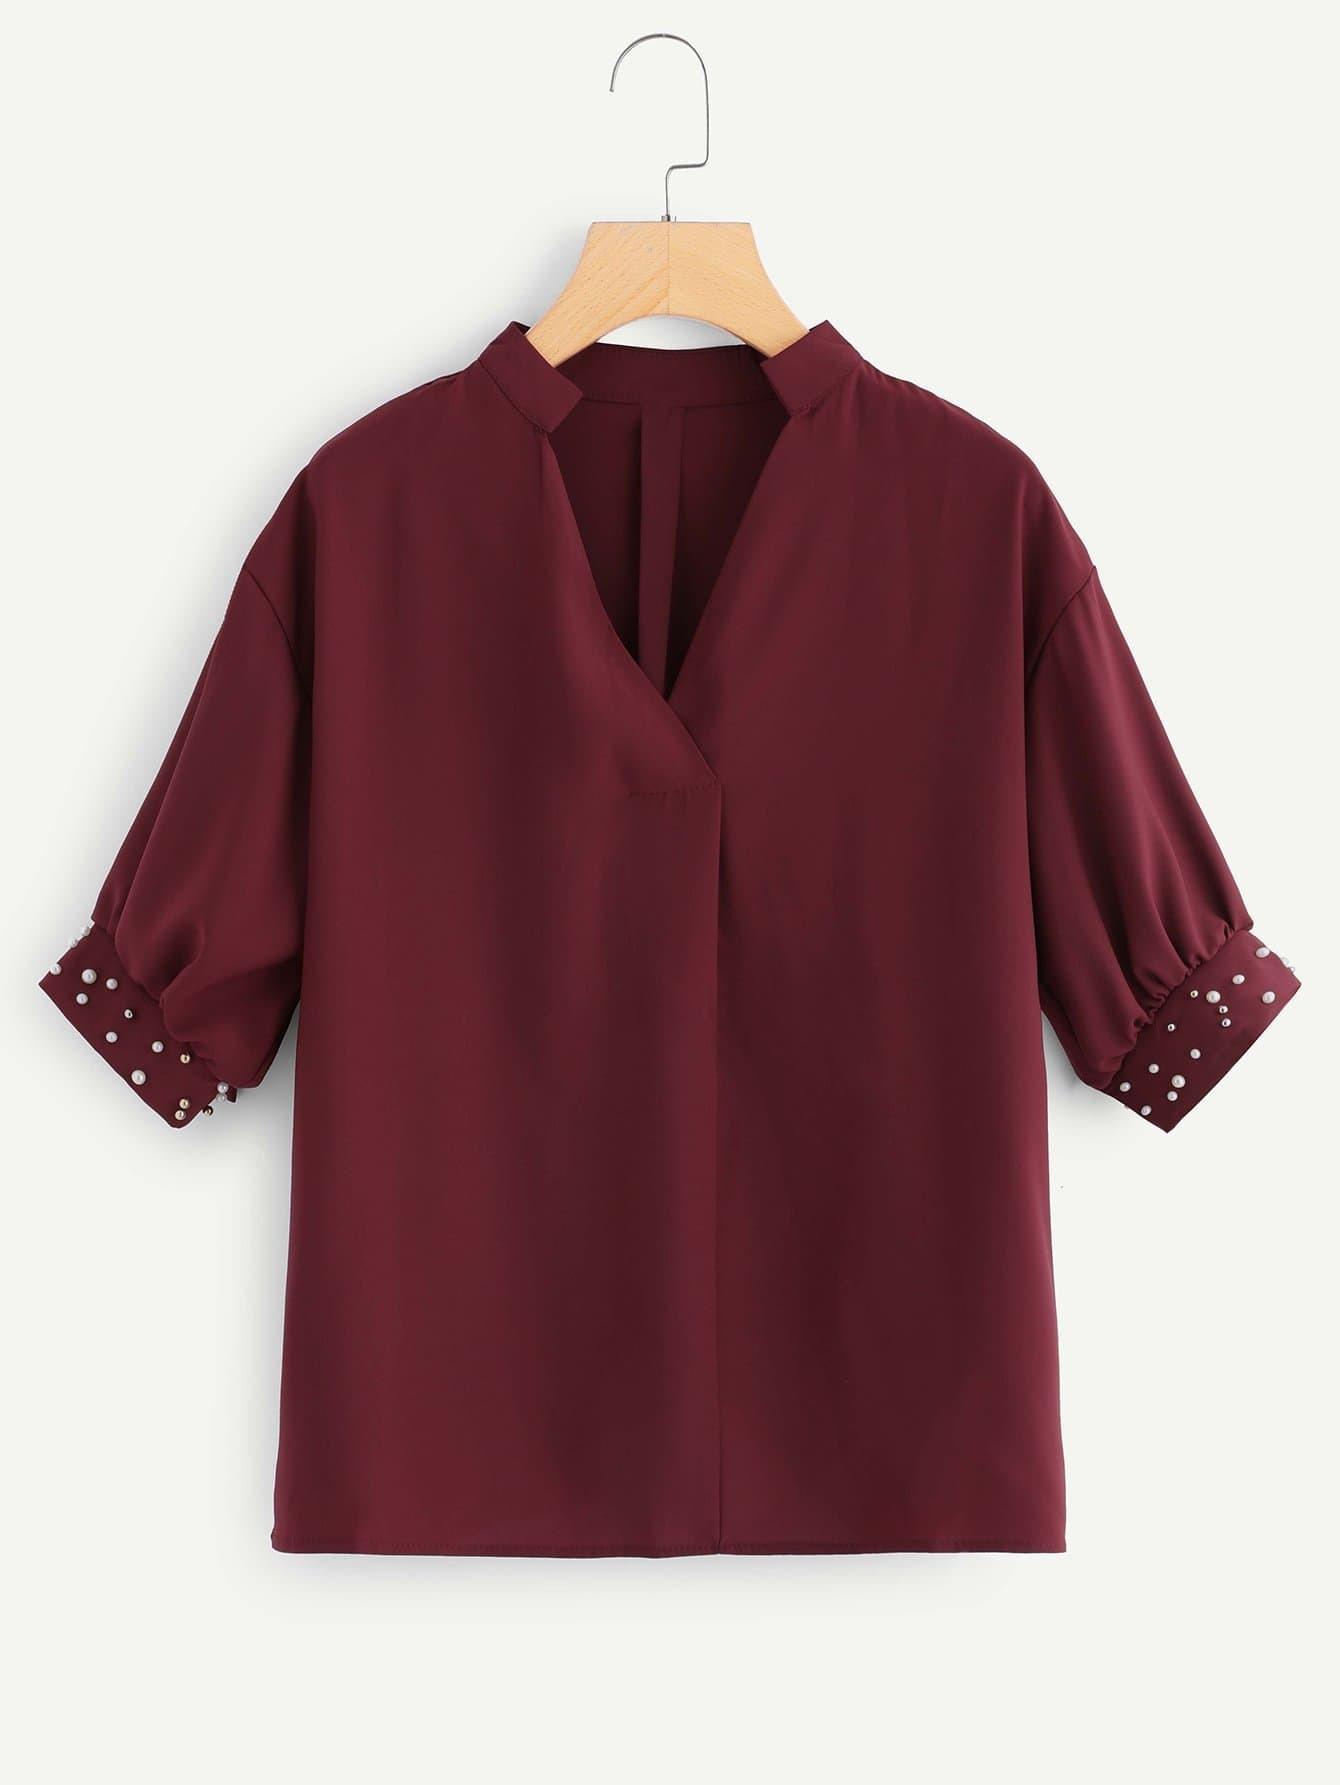 Купить Рубашка и рукава с украшением жемчугов, null, SheIn